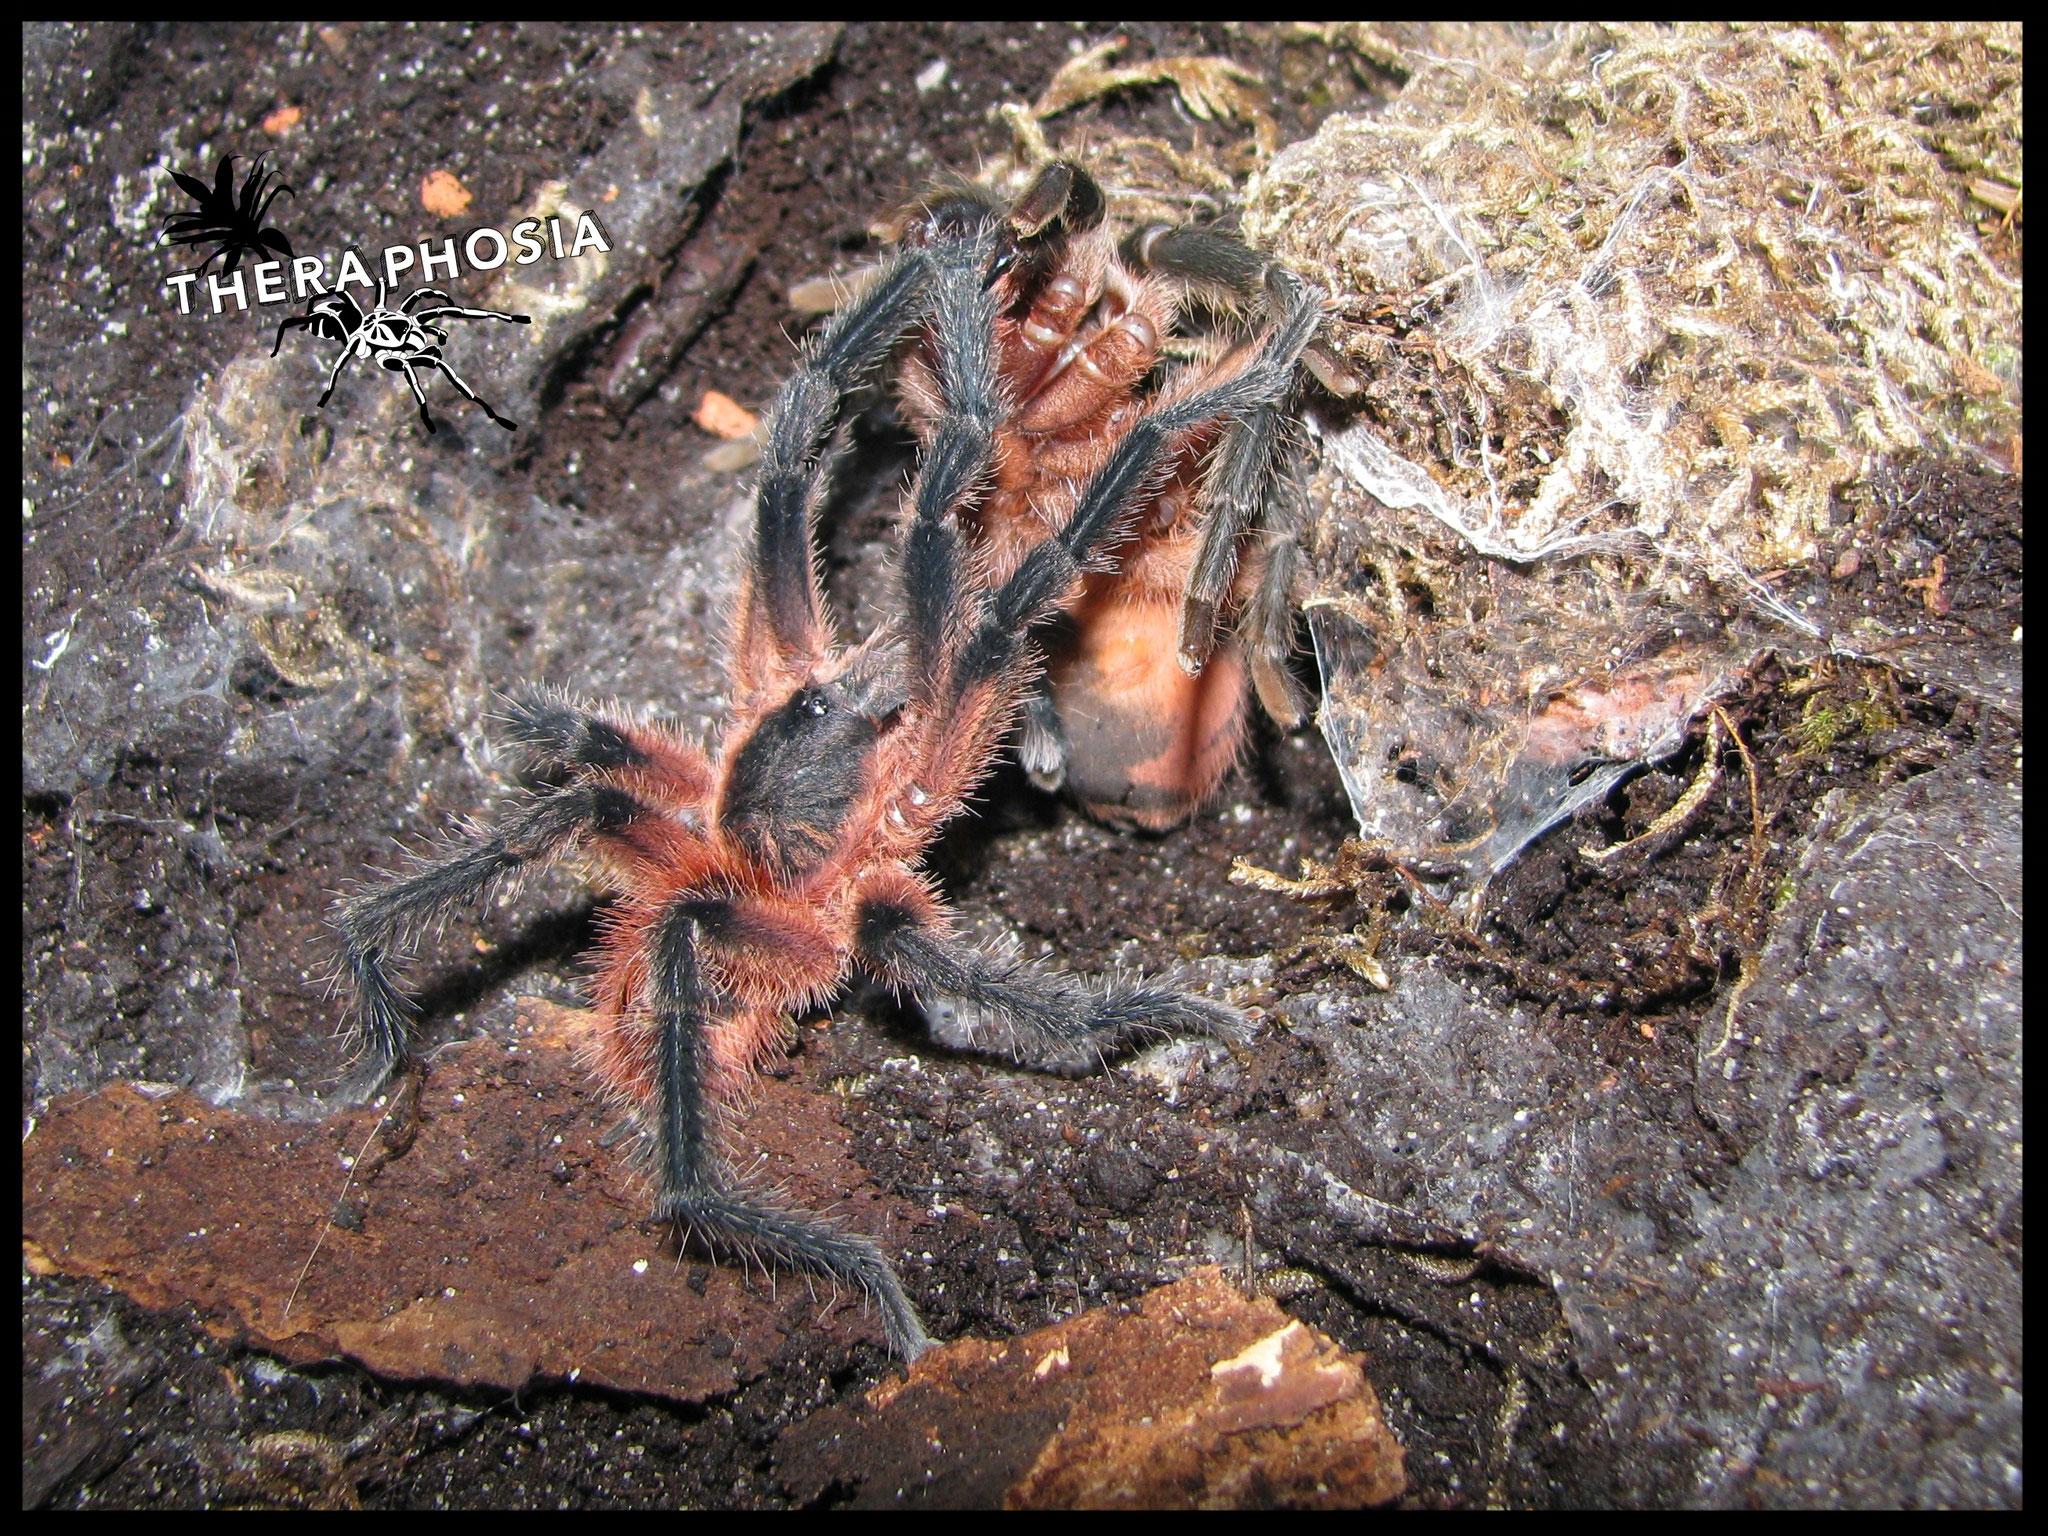 1.1 Theraphosinae sp. Panama